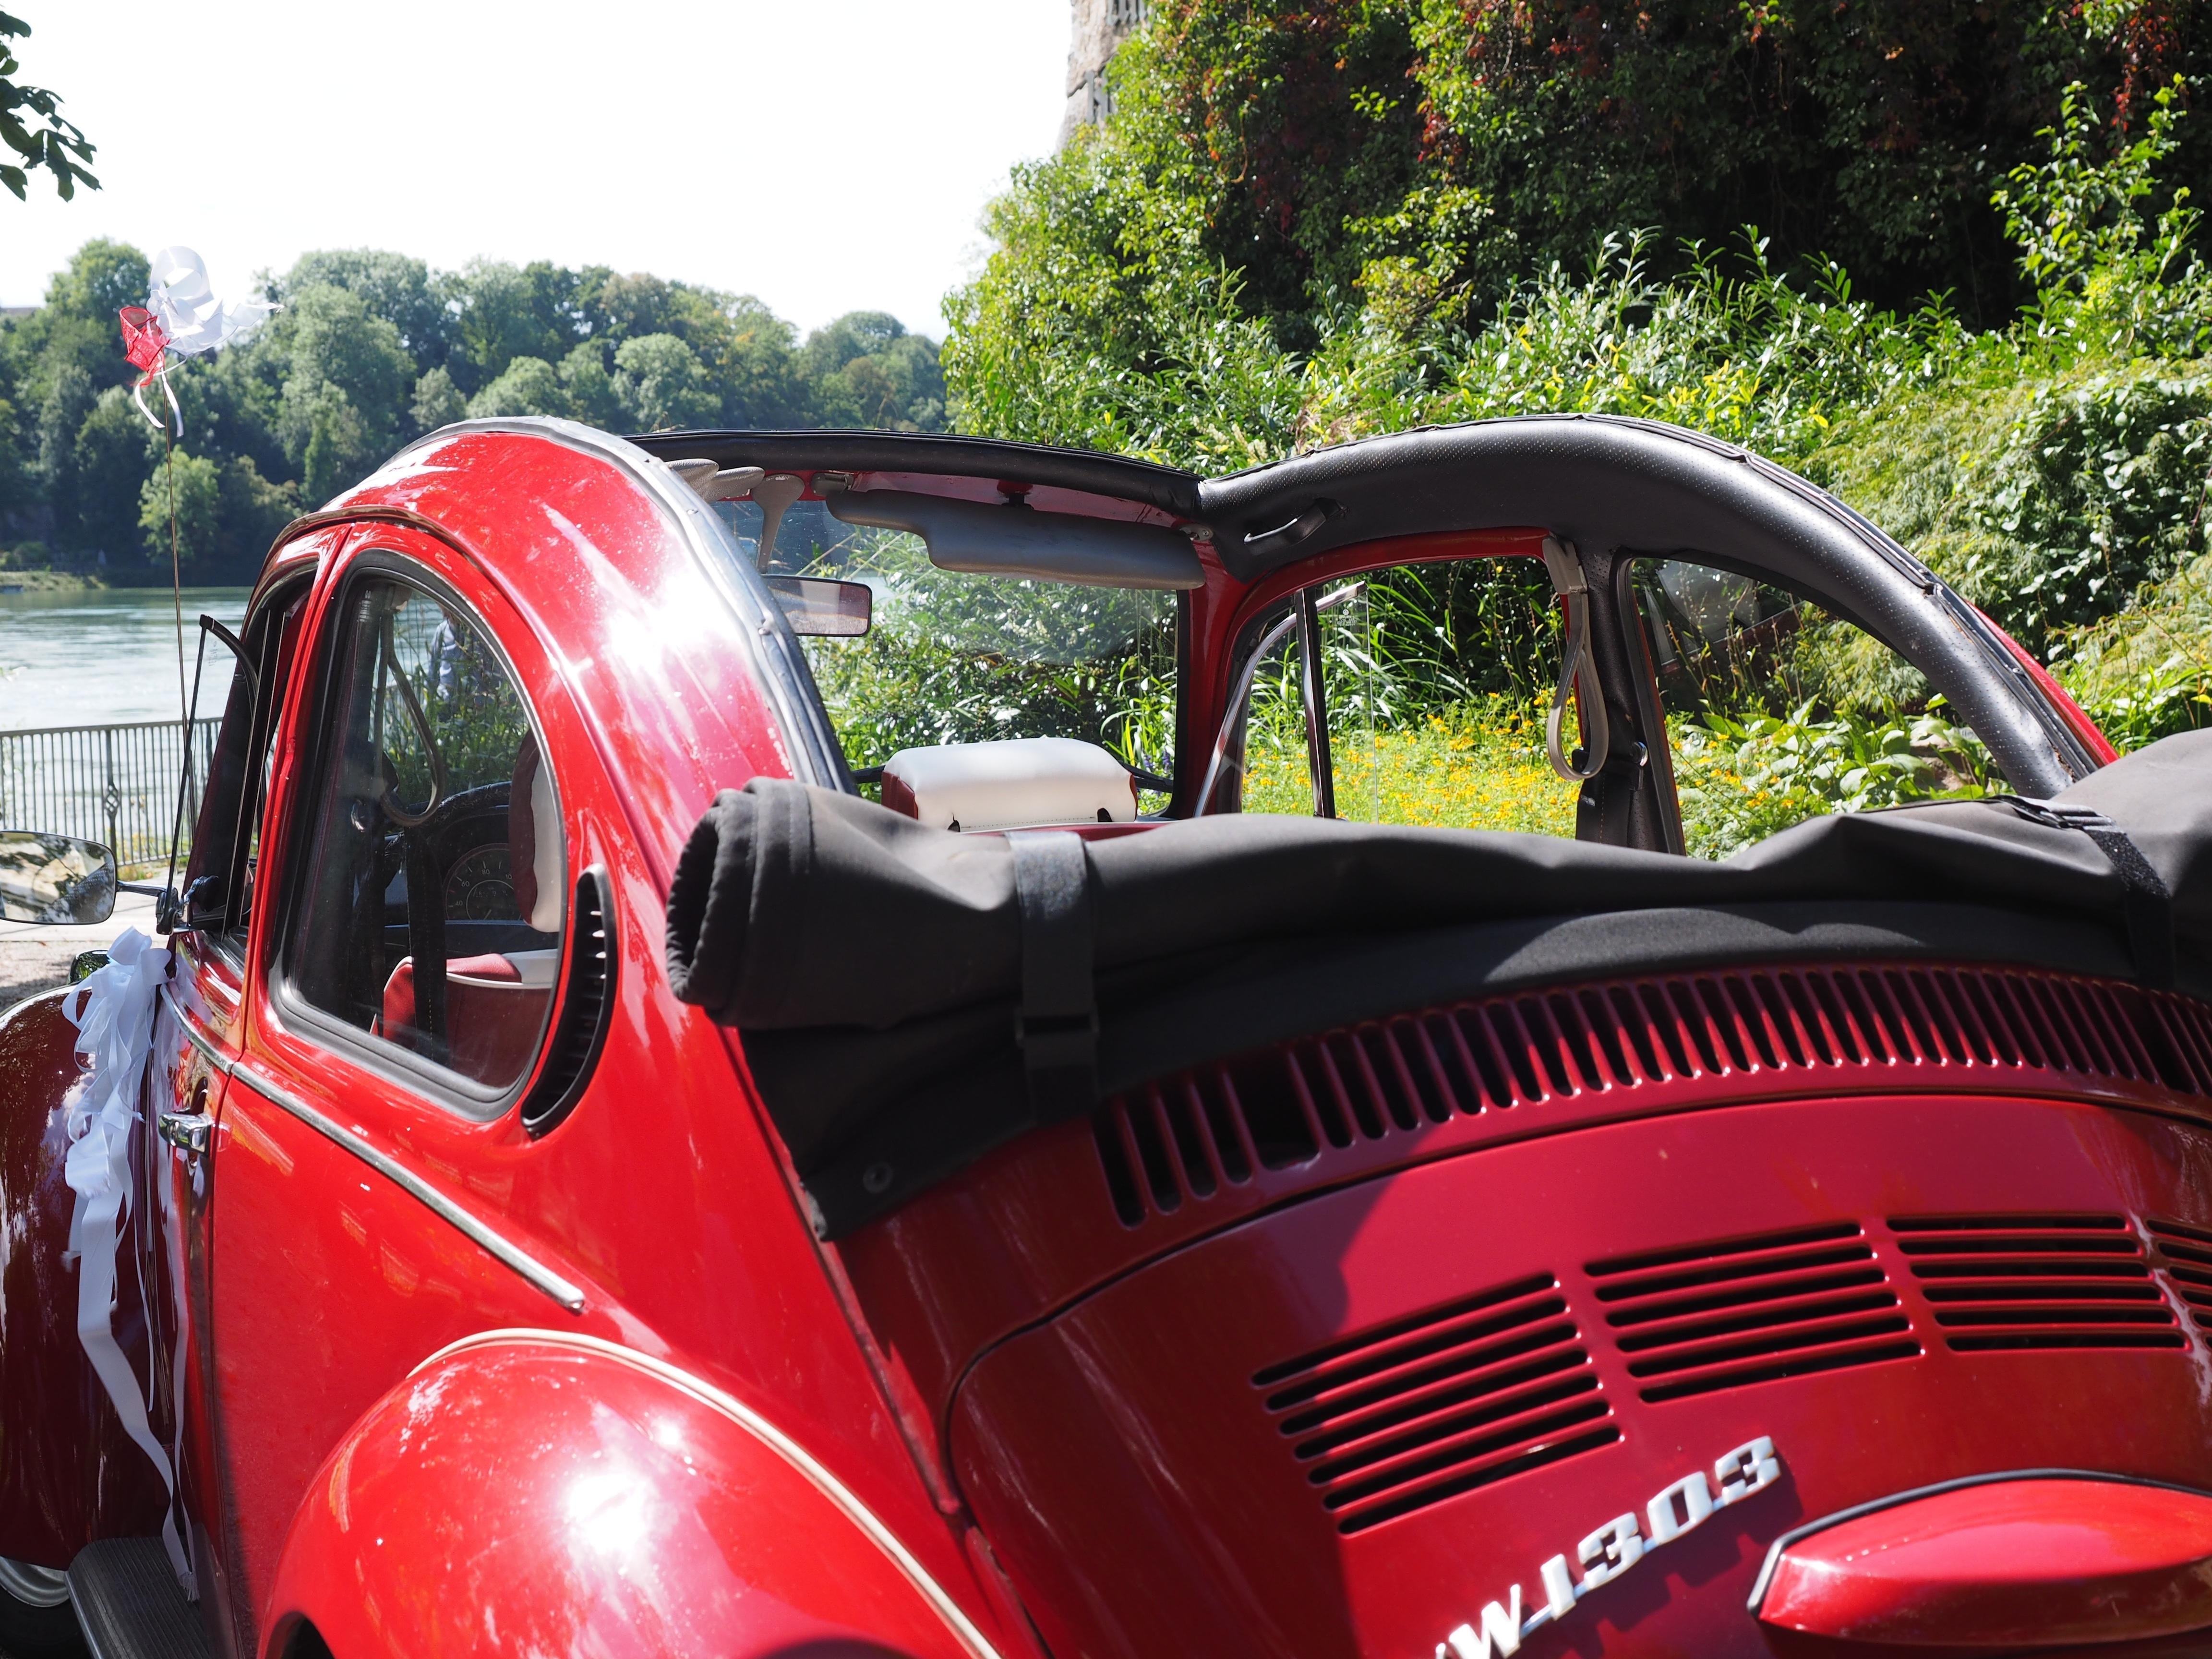 ... Sports Car, Motor Vehicle, Vintage Car, Bumper, Vw Beetle, Supercar,  Lights, Rim, Sedan, Oldtimer, Classic, Convertible, Pkw, Cabriolet, Antique  Car, ...